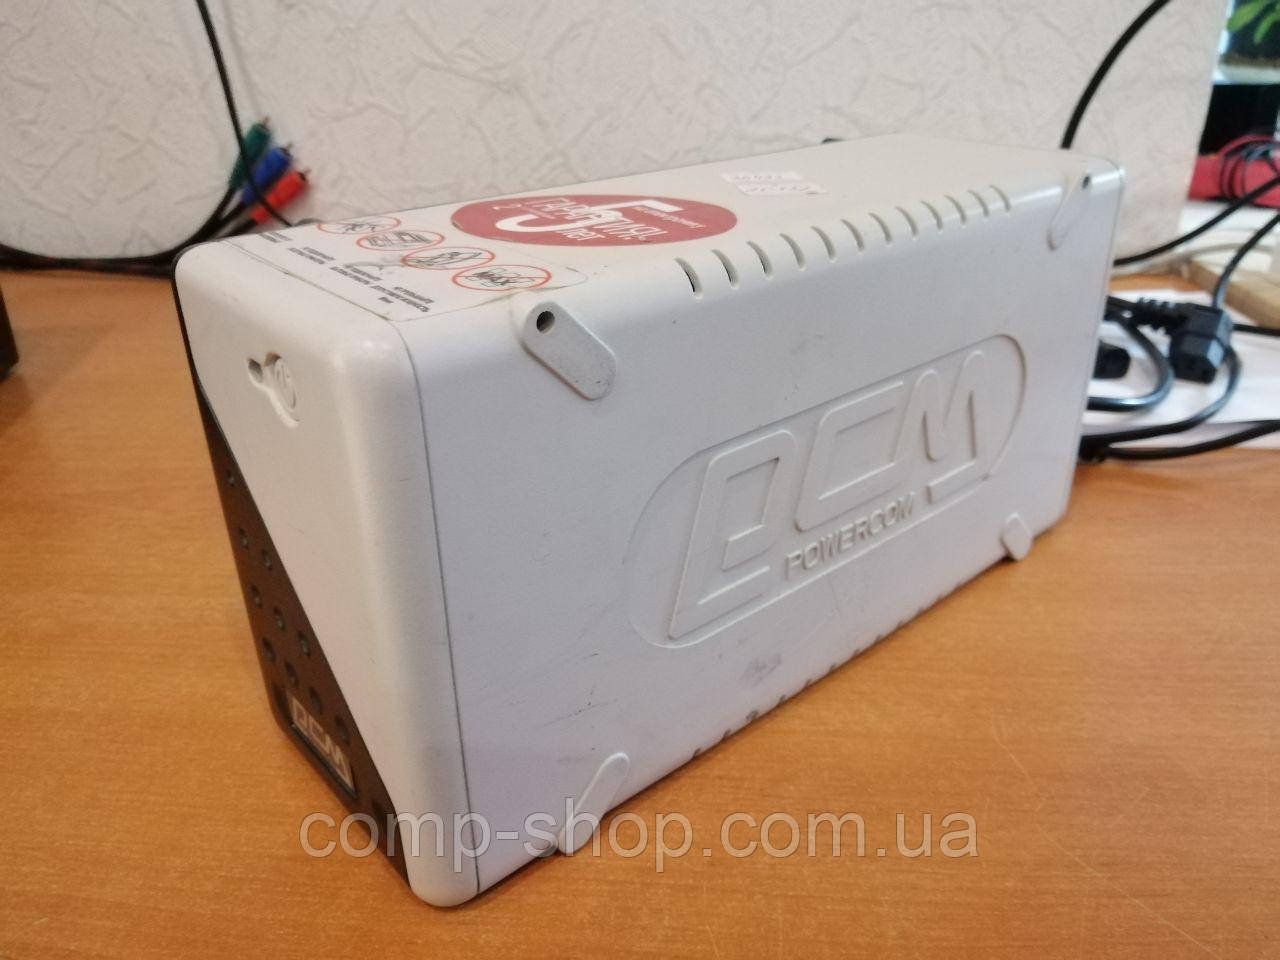 ИБП PowerCom WAR 600A